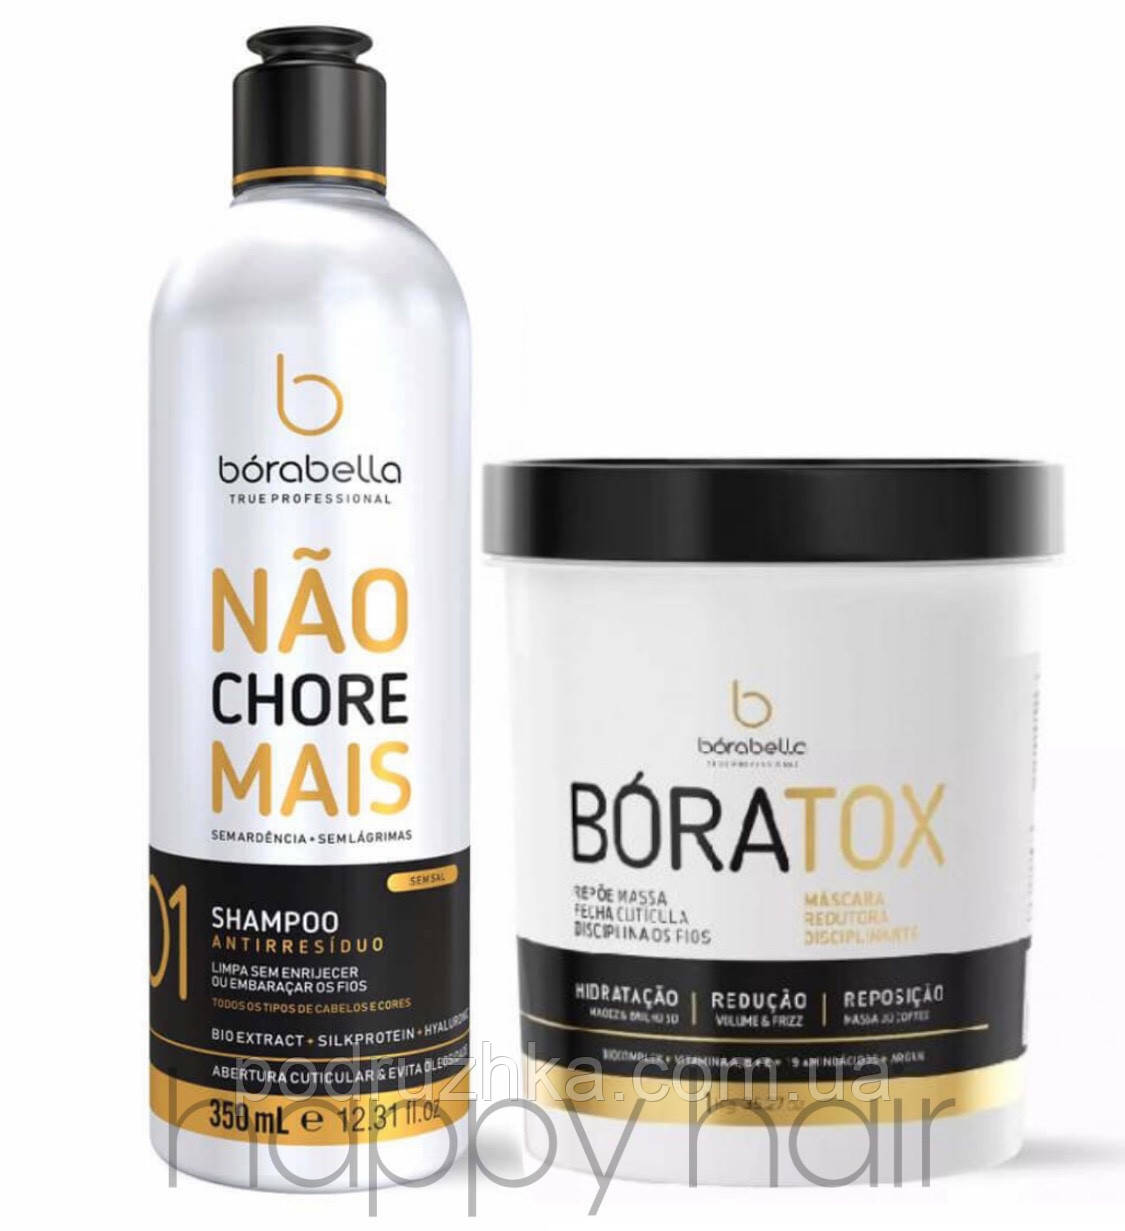 Borabella Organic Boratox Набор ботекс для волос 2х500 г